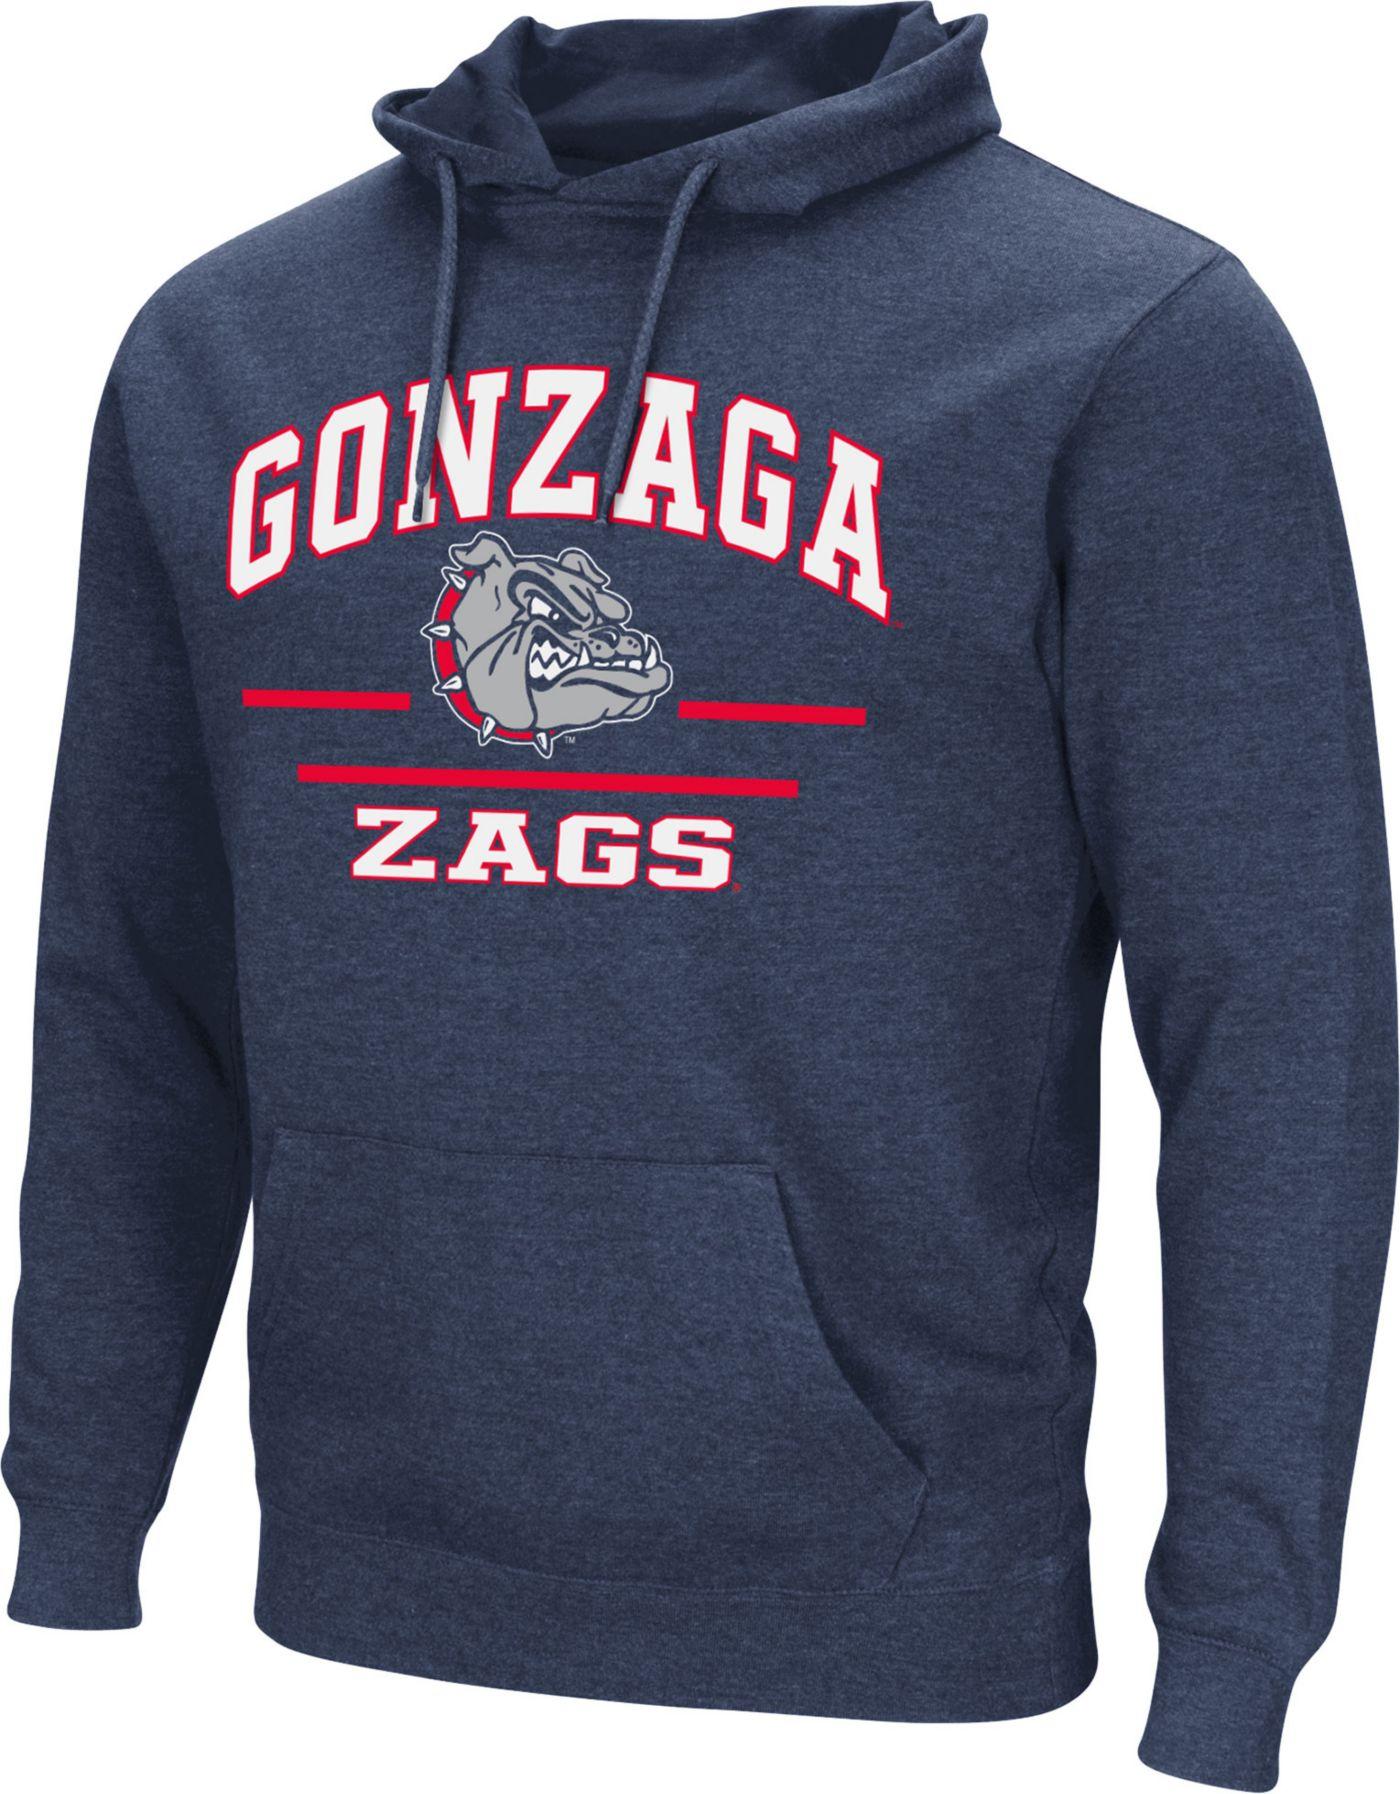 Colosseum Men's Gonzaga Bulldogs Blue Campus Pullover Hoodie